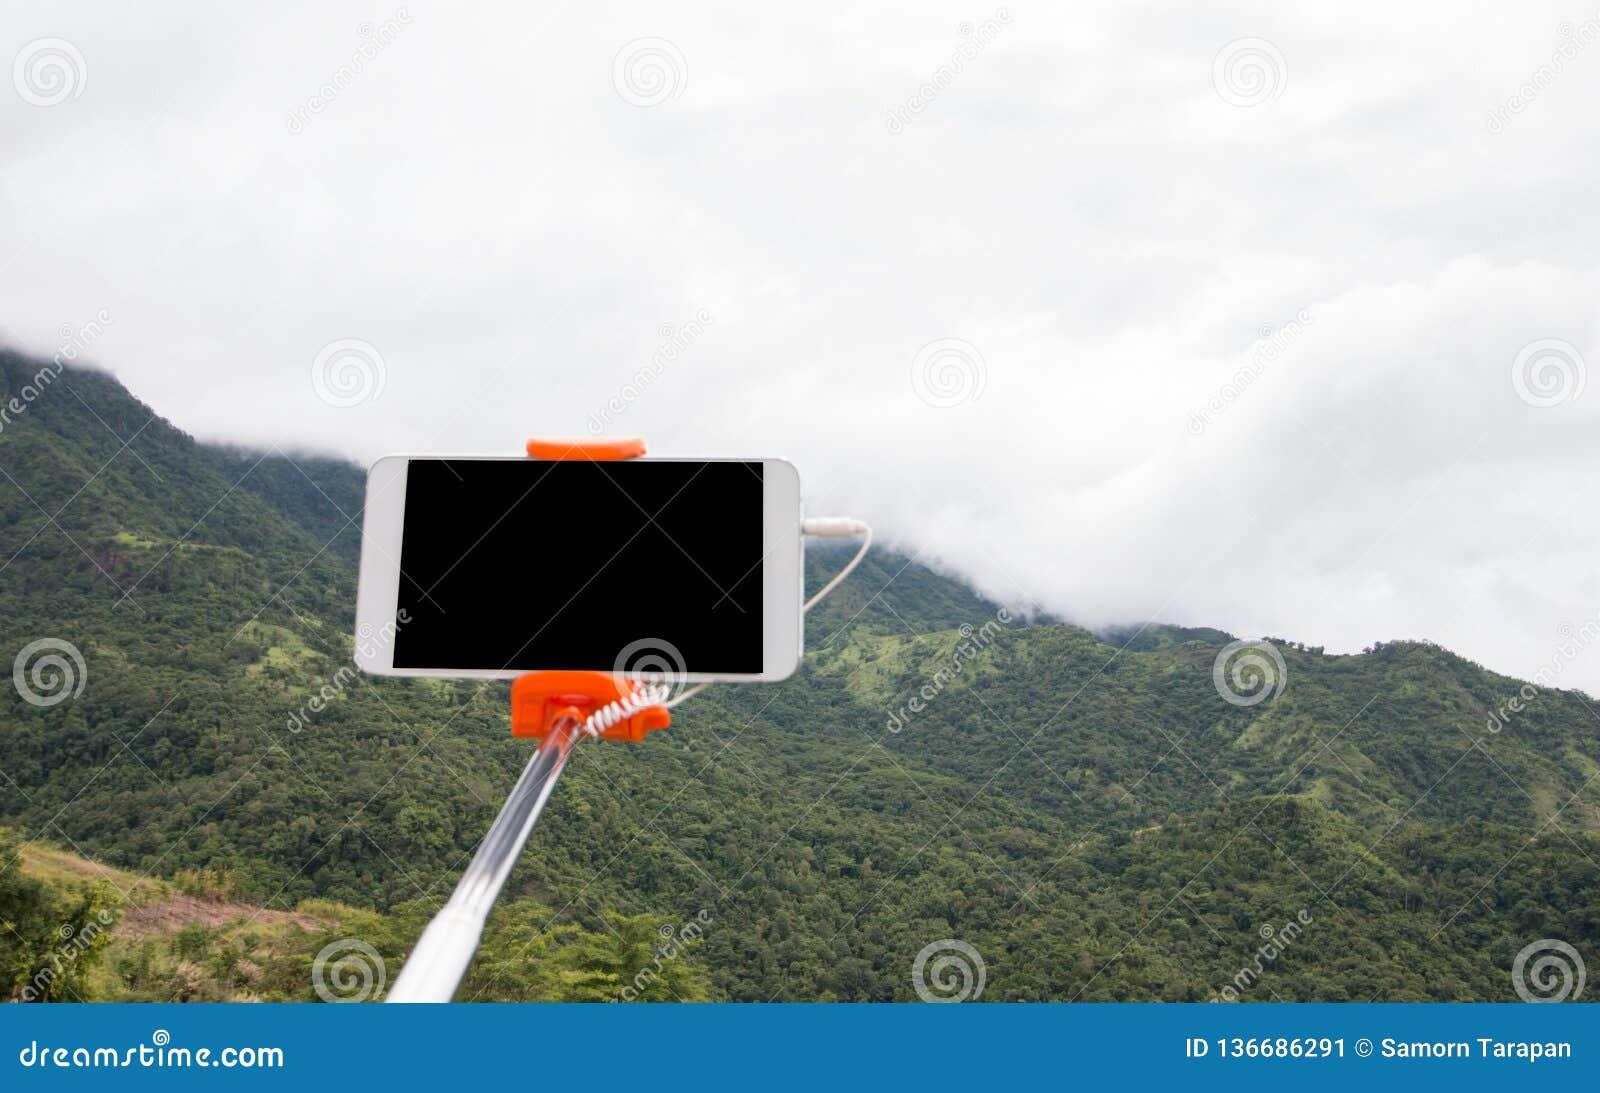 Selfie fotobegrepp: Extensible selfiepinne eller monopod med mobiltelefonen som tar bilden som skjutas på den utomhus- bergsikten